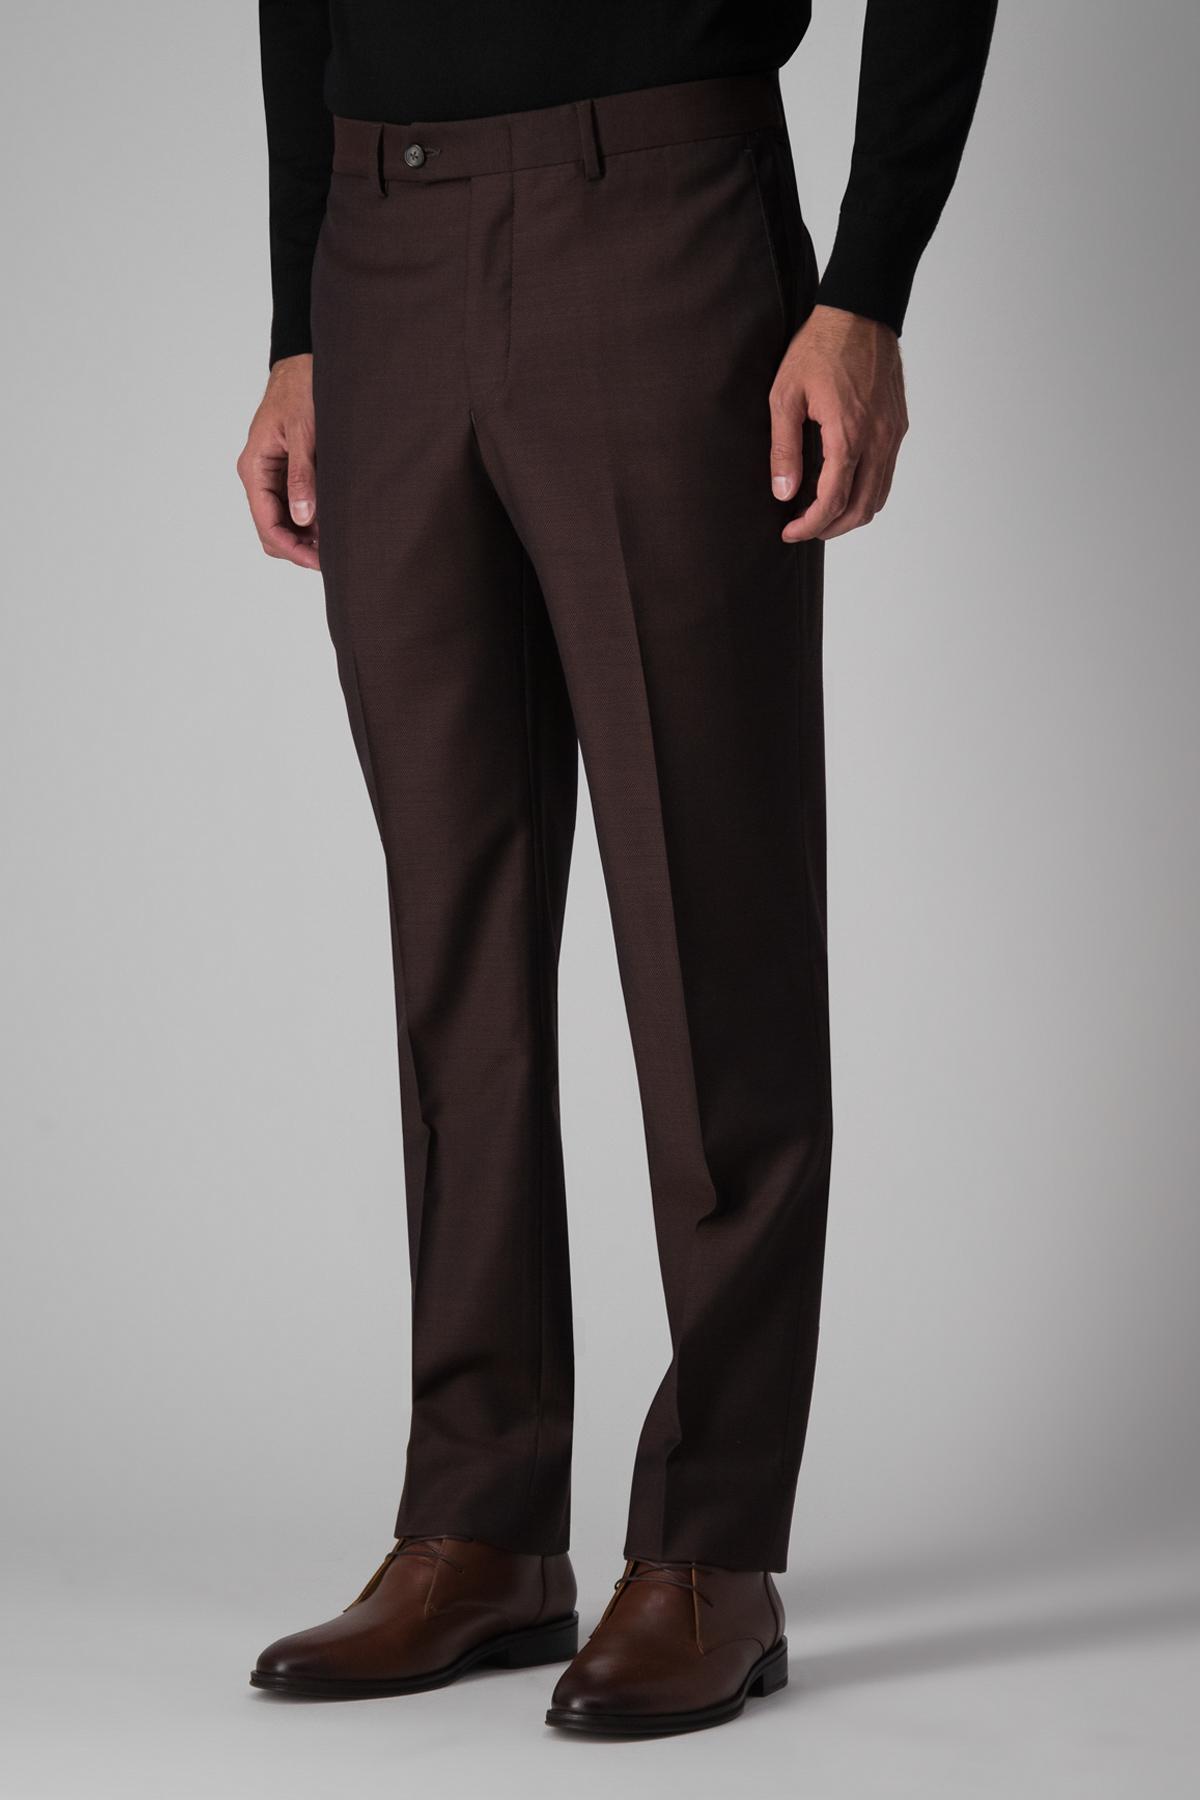 Pantalón Robert´s 100% lana, color vino trama diagonal.